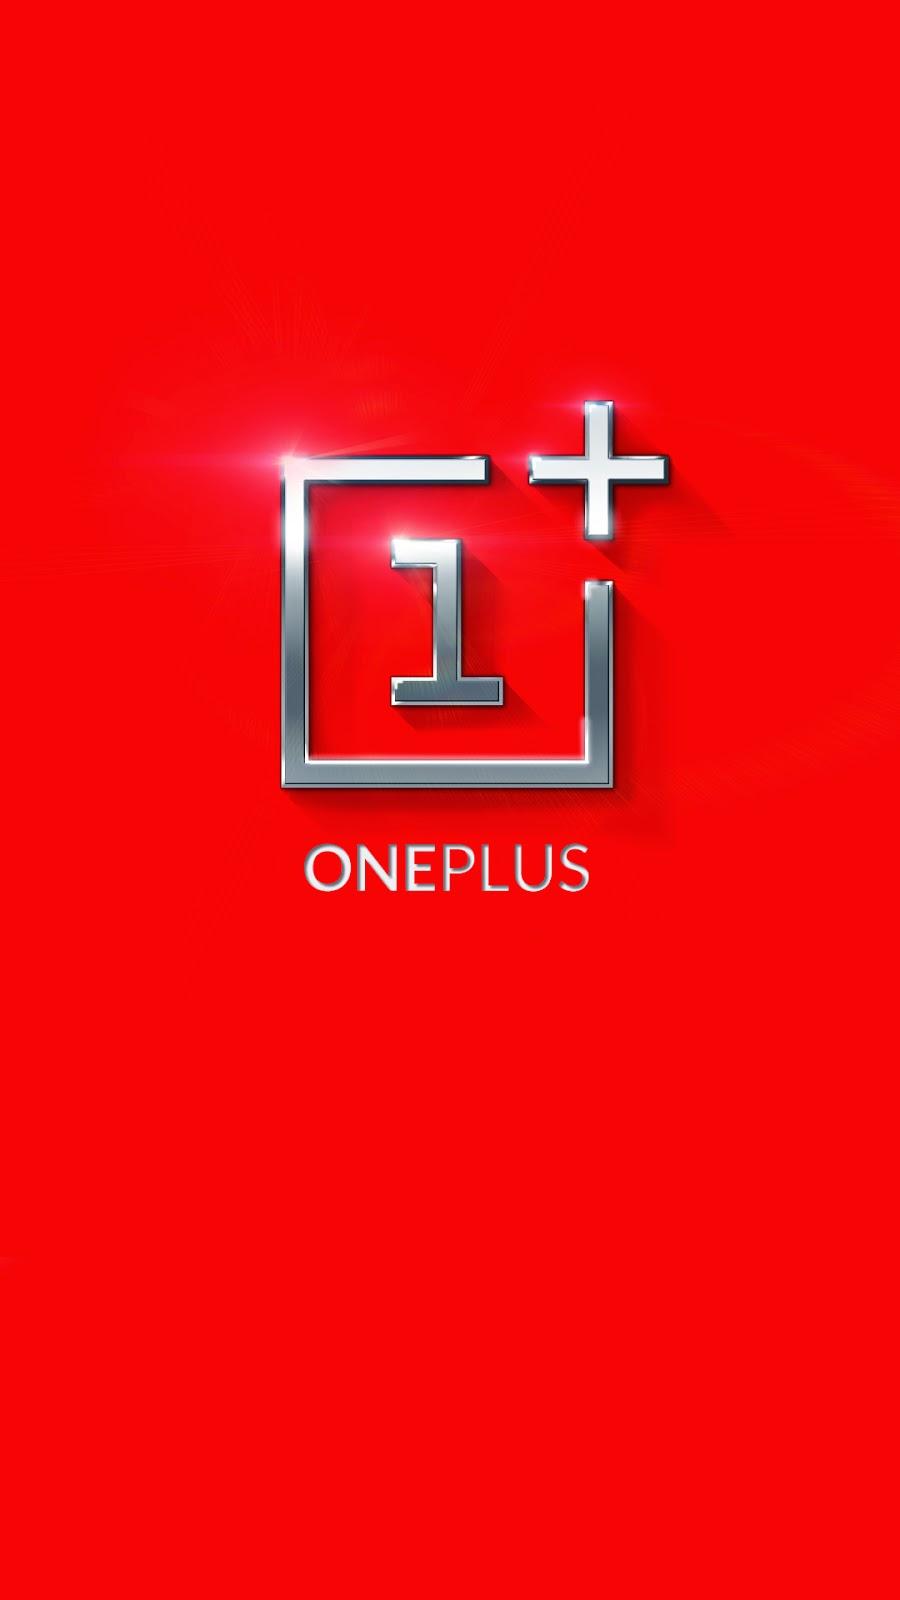 OnePlus Wallpaper Replica   OnePlus Forums 900x1600